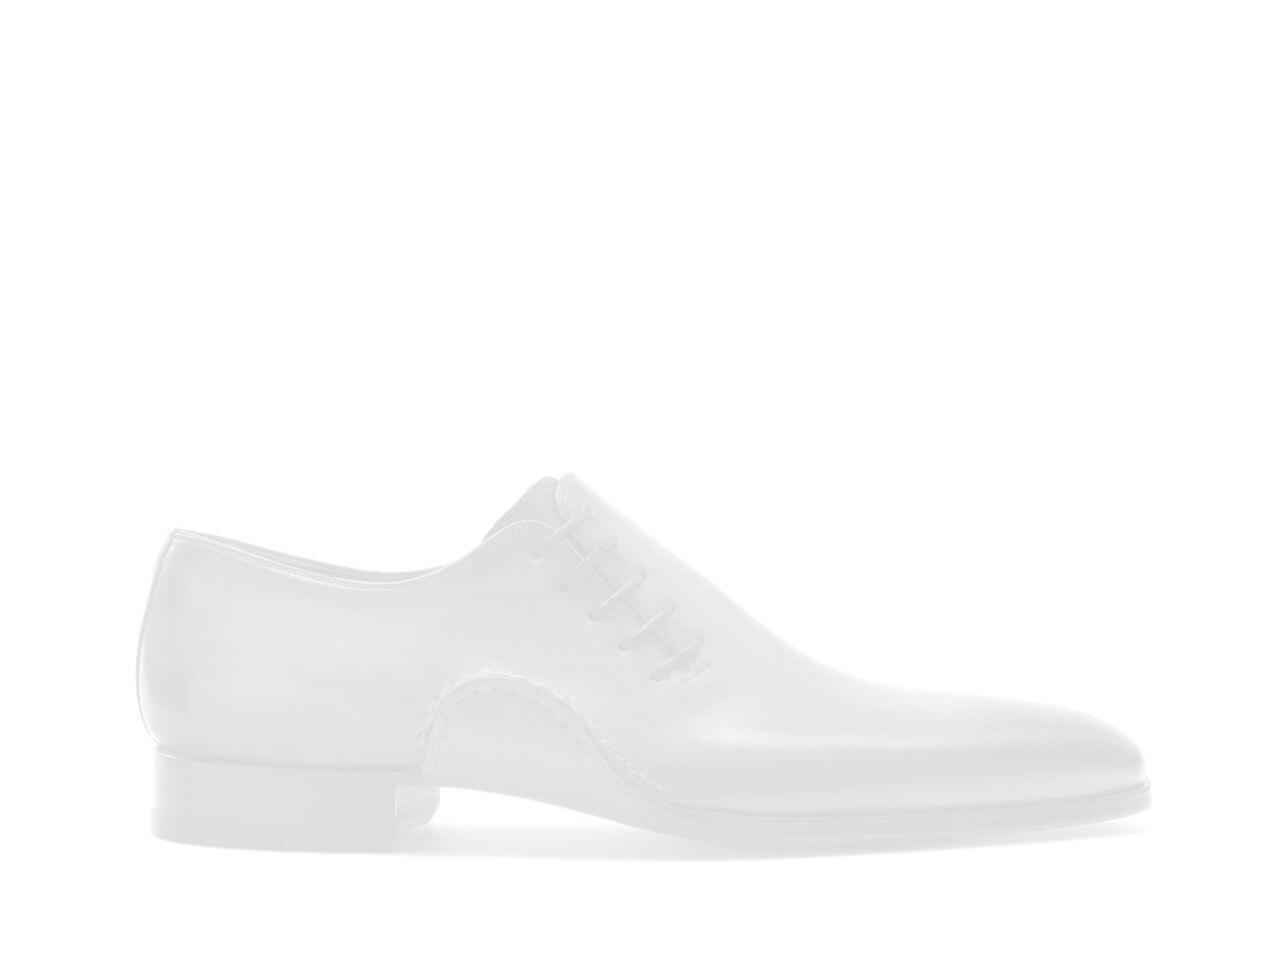 Sole of the Magnanni Cruz Royal Men's Oxford Shoes